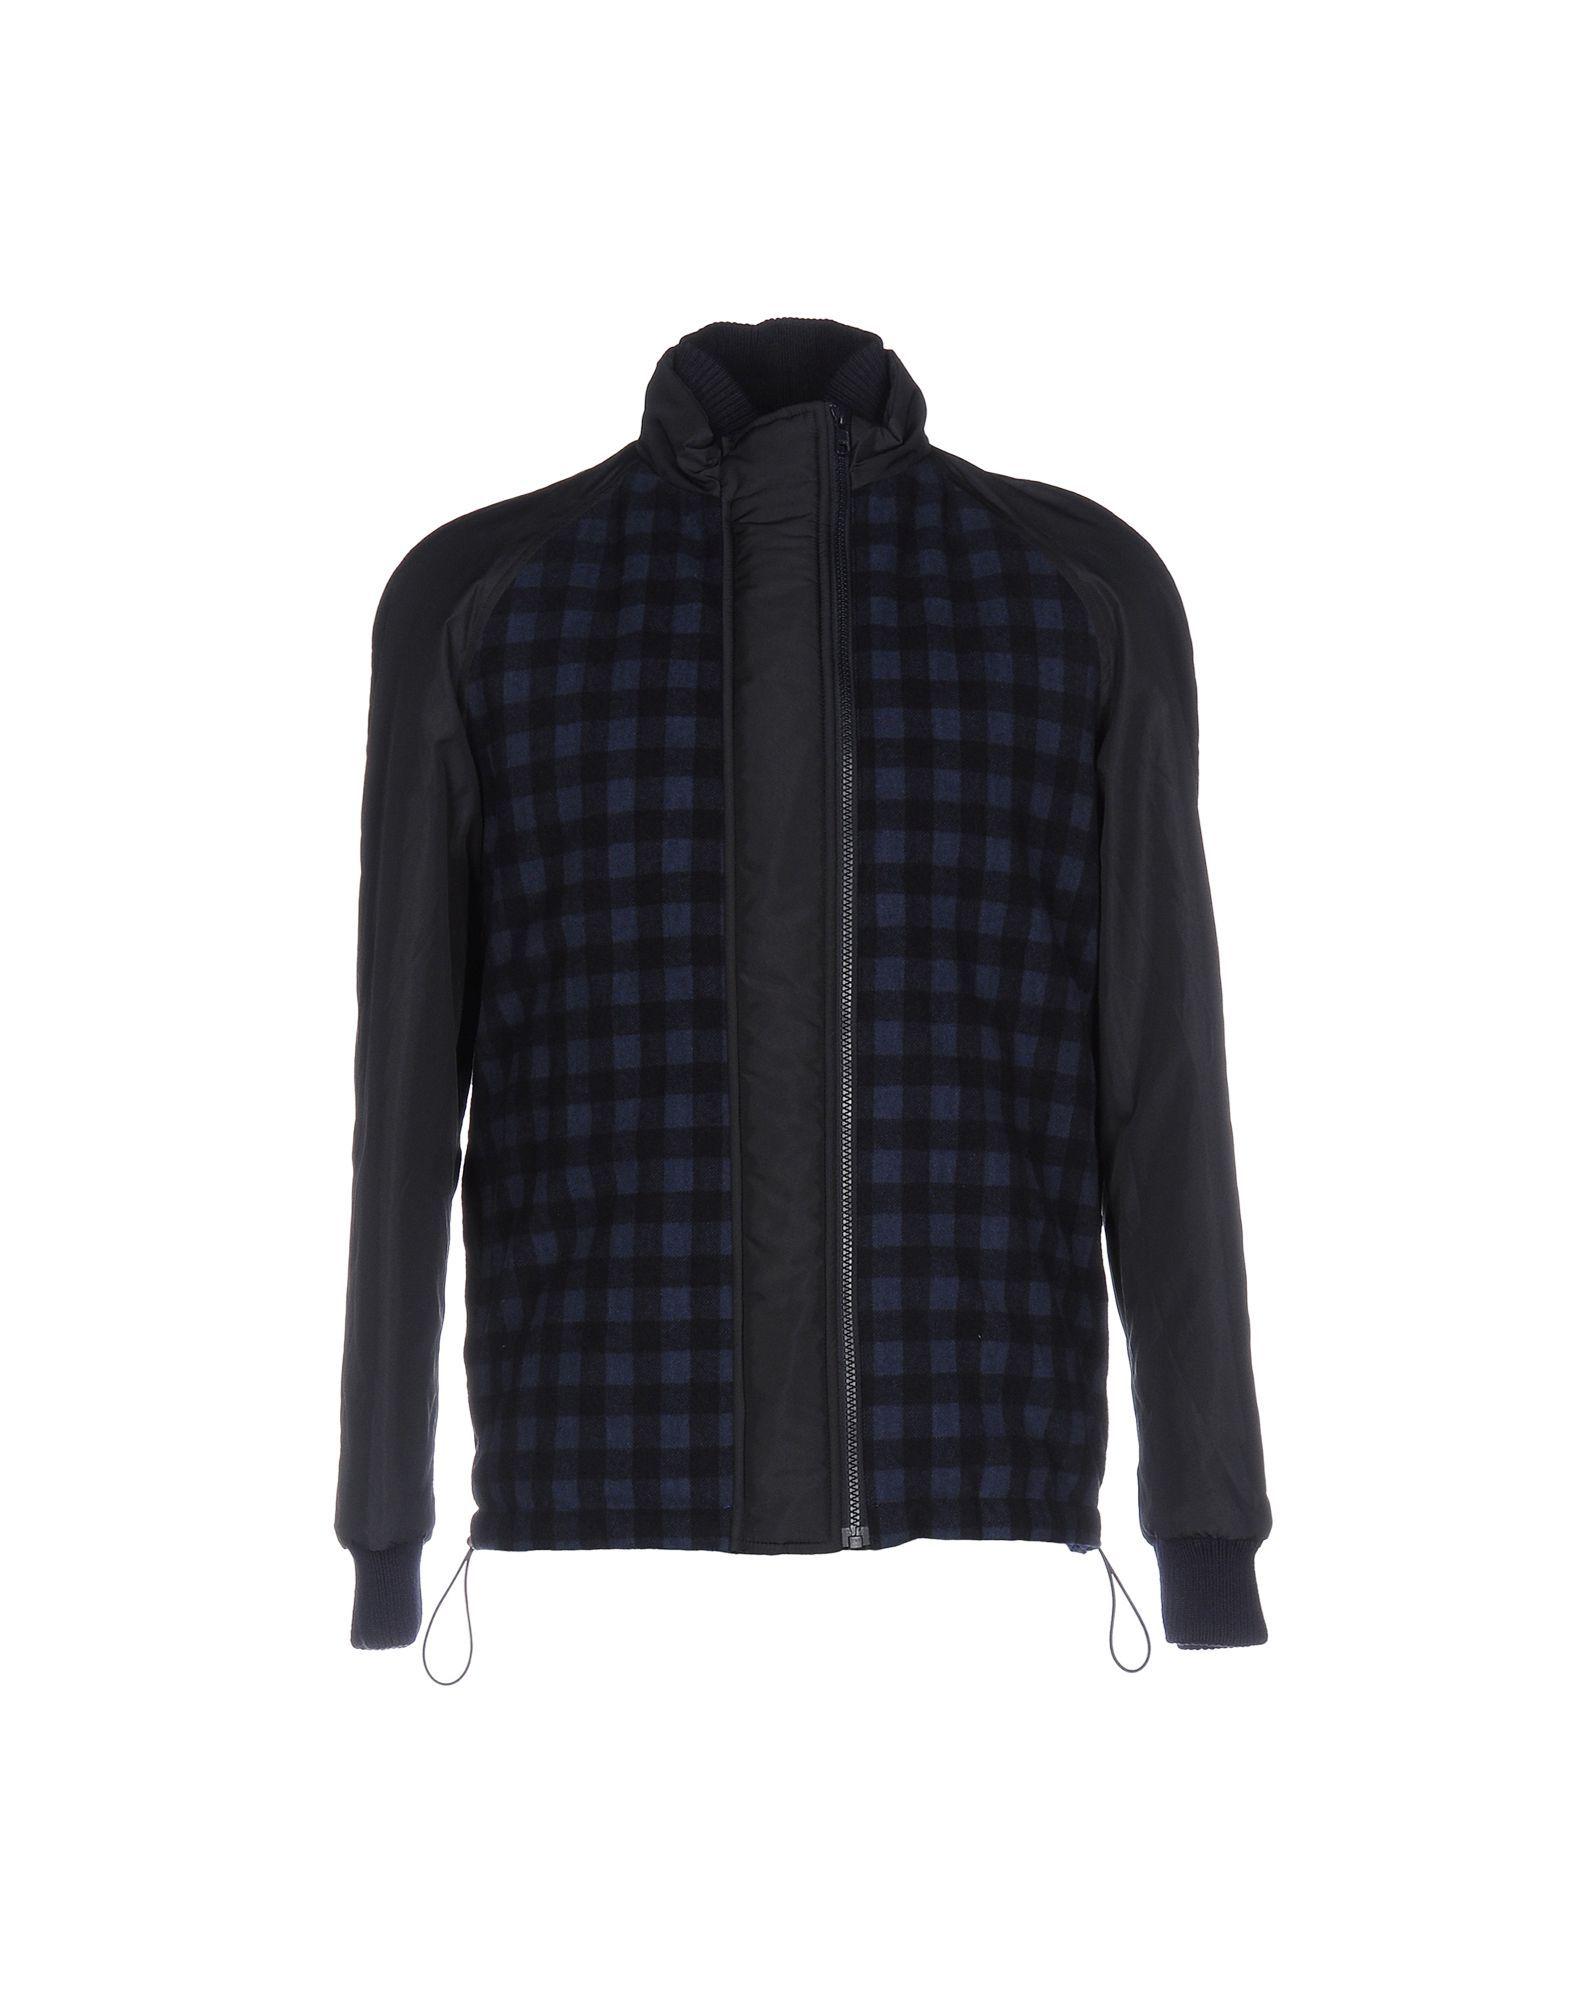 Daniele Alessandrini Homme Dark Blue Check Wool Jacket